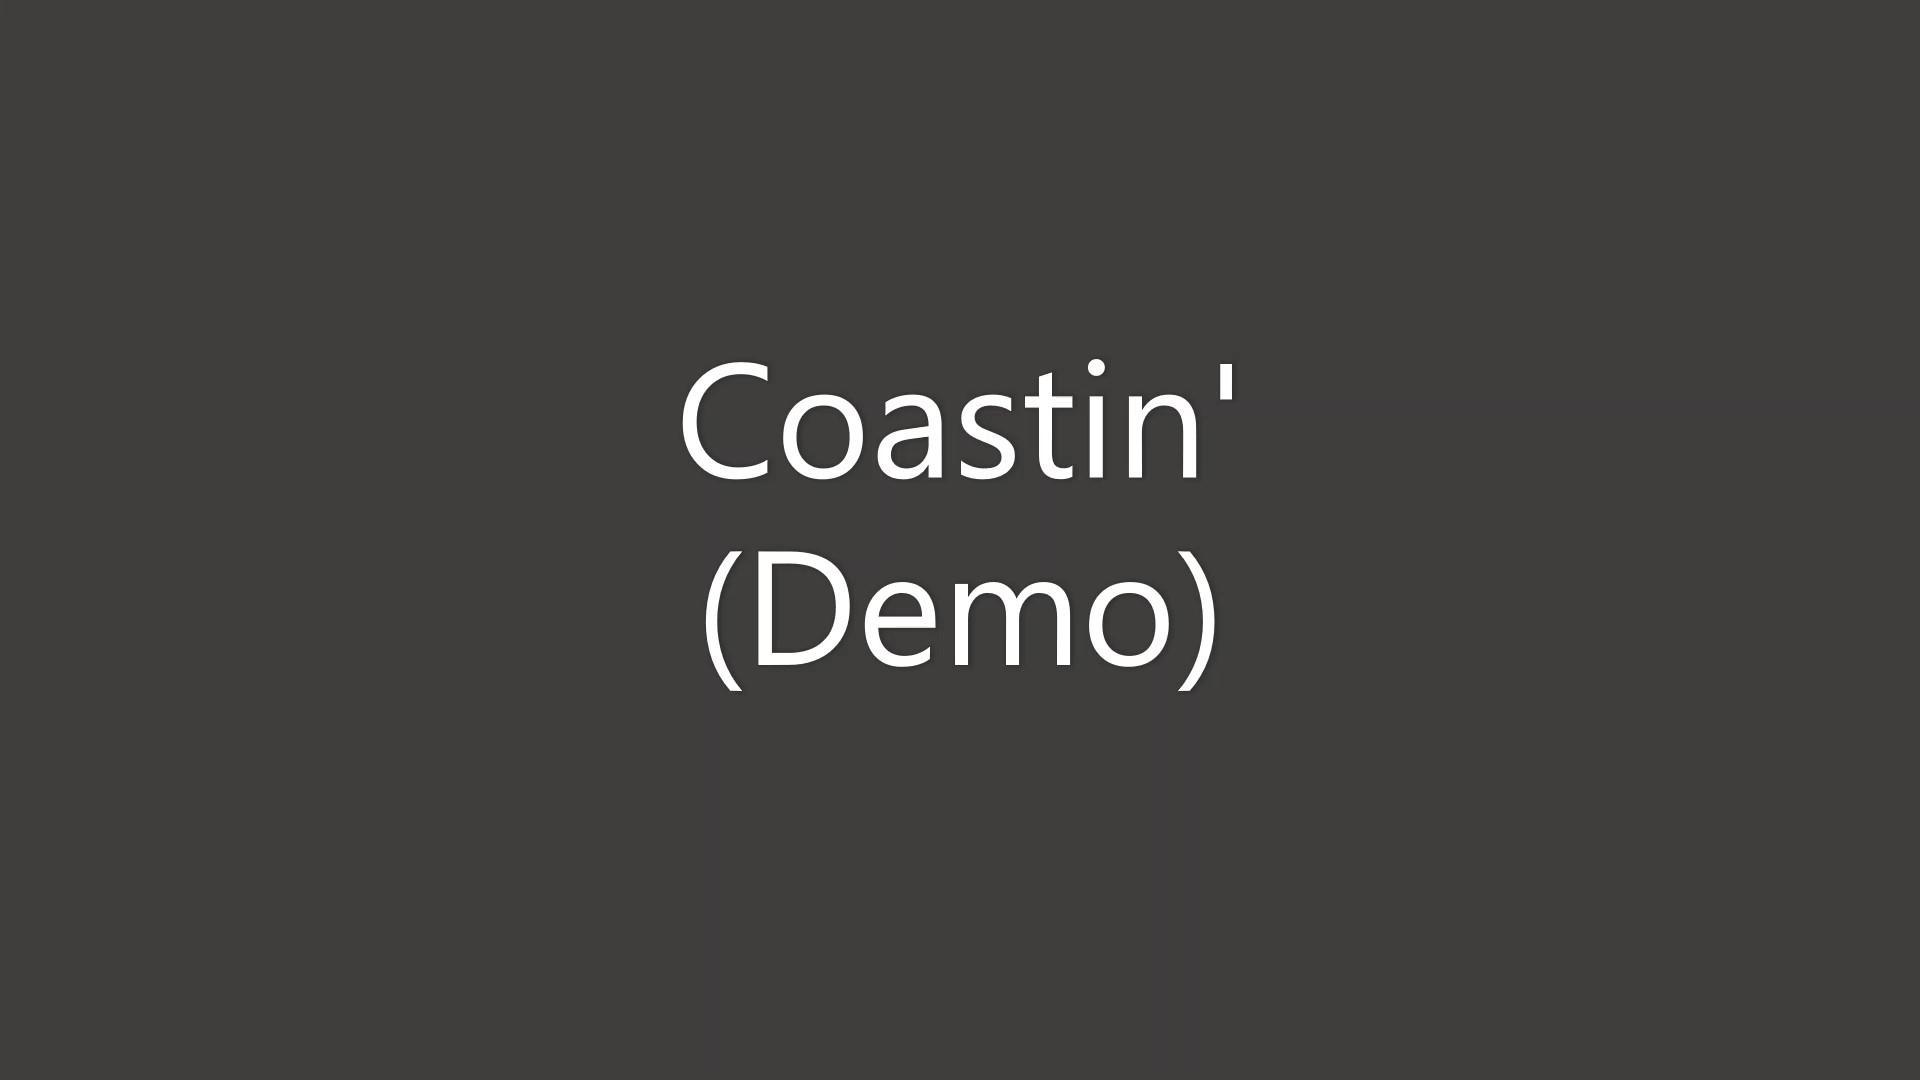 Coastin' Demo